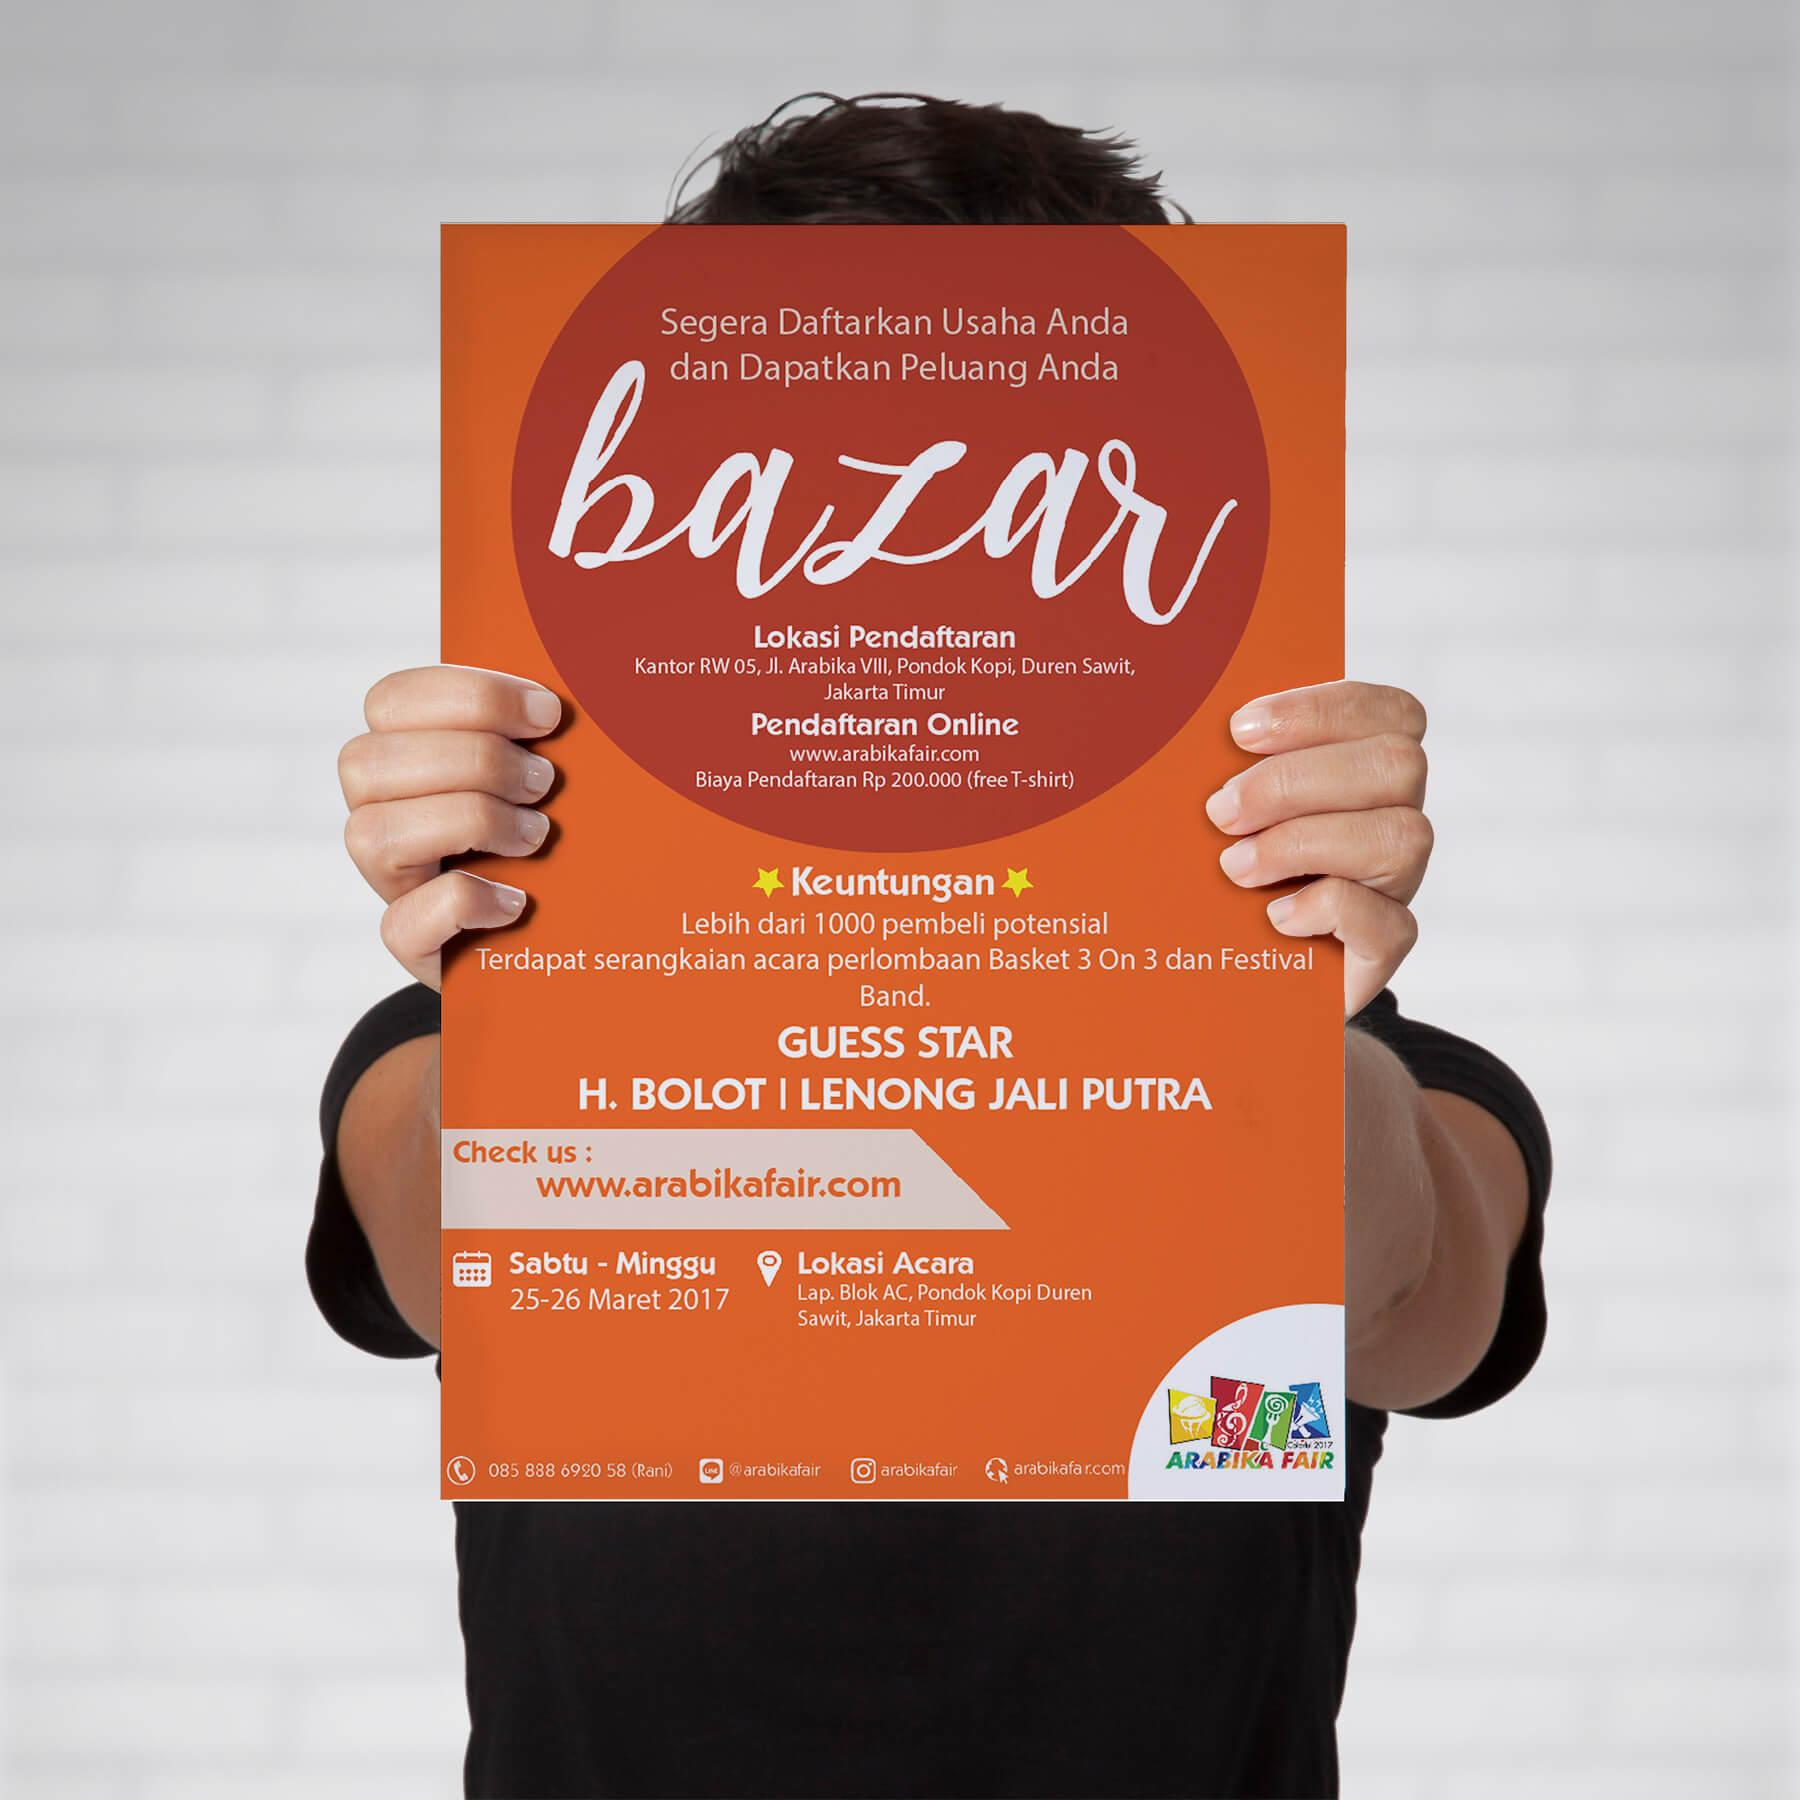 Desain Prita - Arabika Fair - Poster Bazar